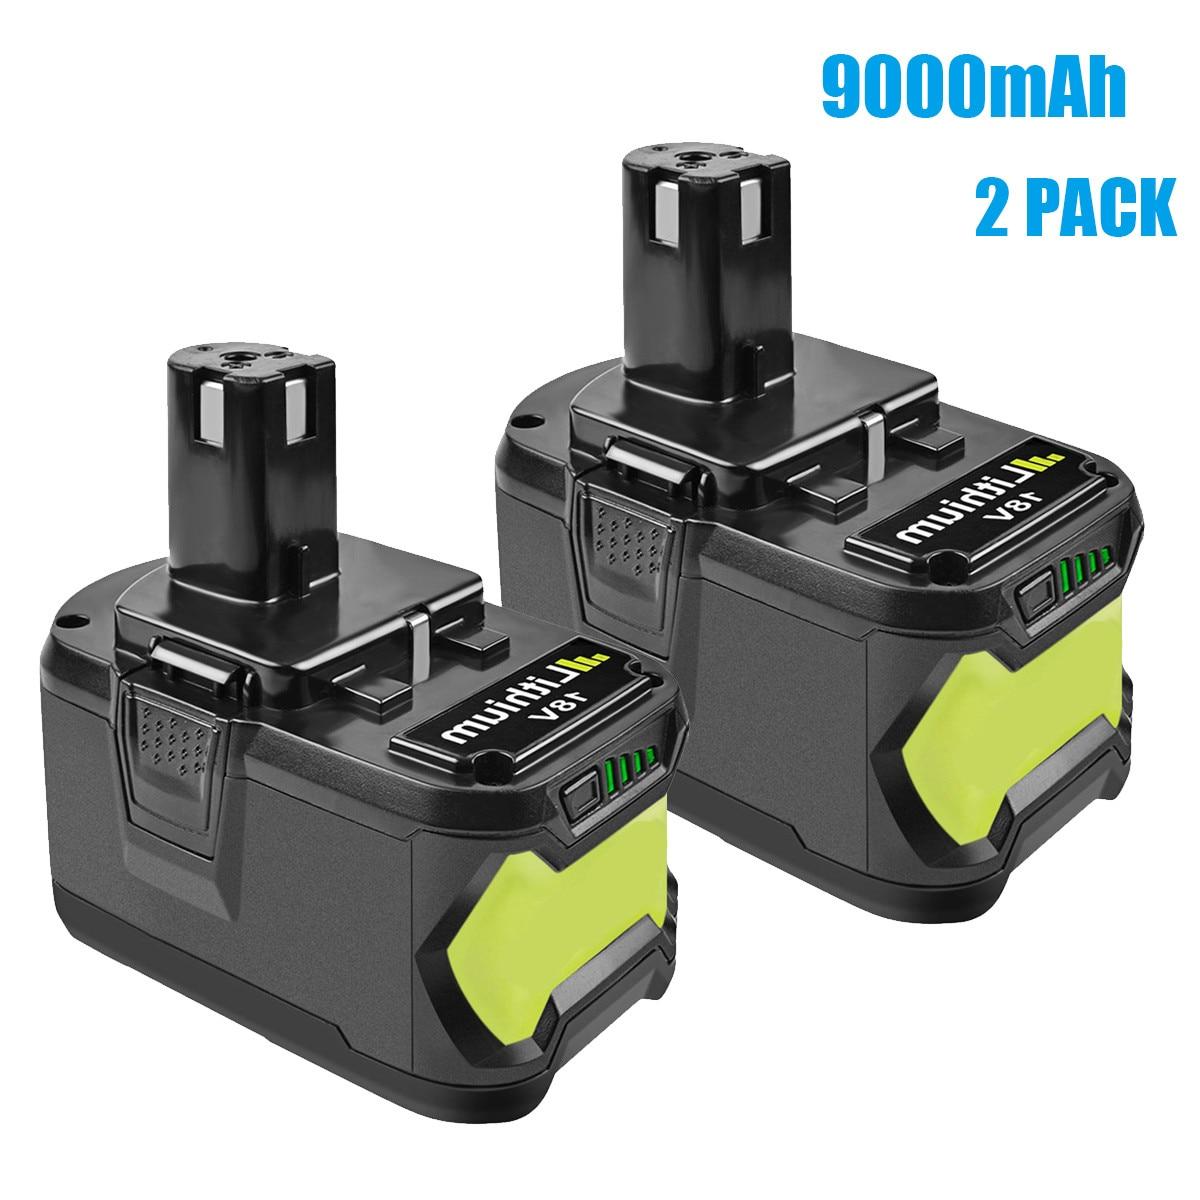 Bonadget Замена для Ryobi 18V 6000mAh 9000mAh P108 батареи RB18 литий-ионная аккумуляторная батарея электроинструменты батарея